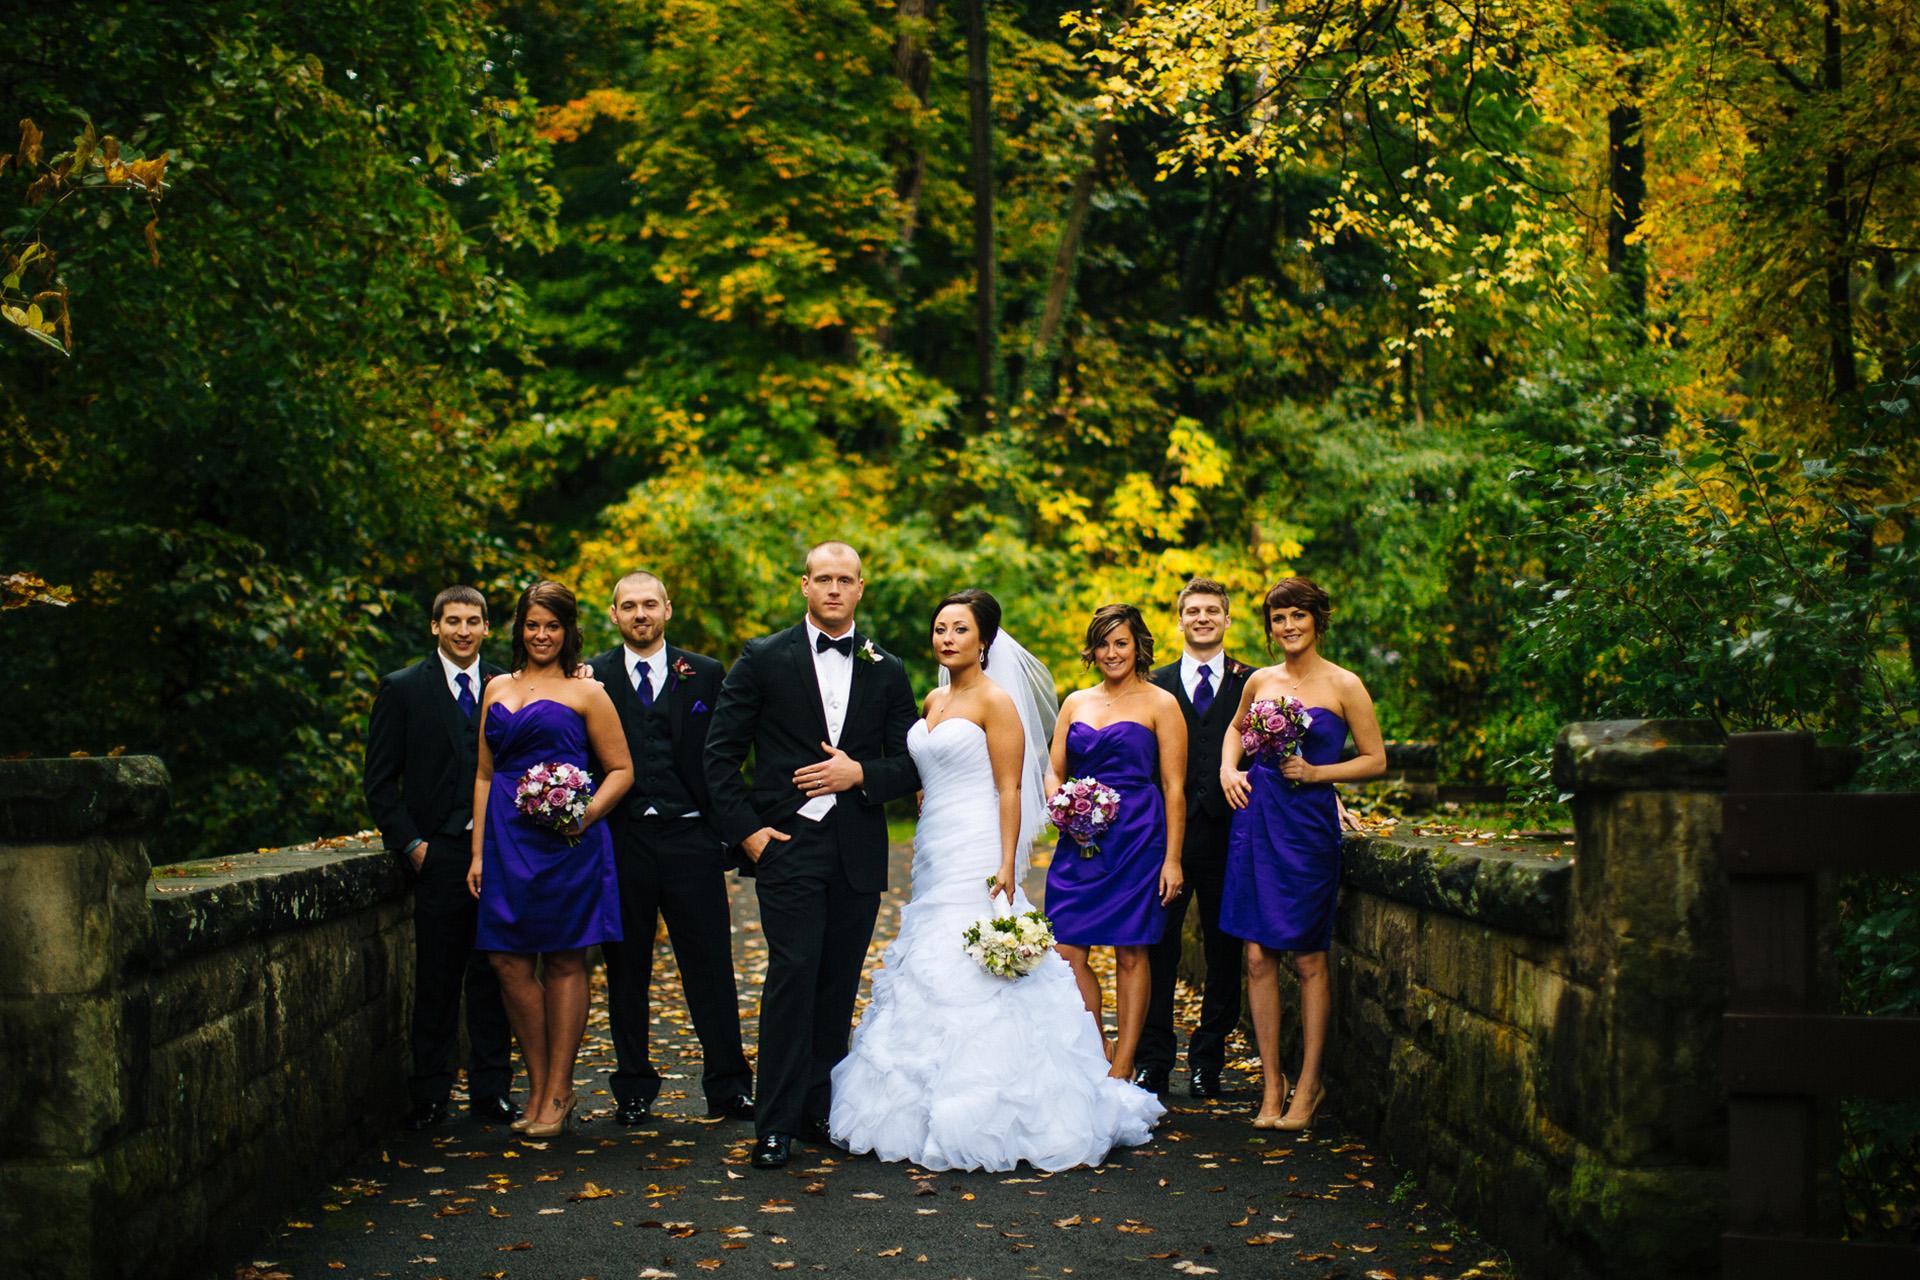 Cleveland Wedding Photographer St Christopher's Church Red Tail Golf Club 18.jpg